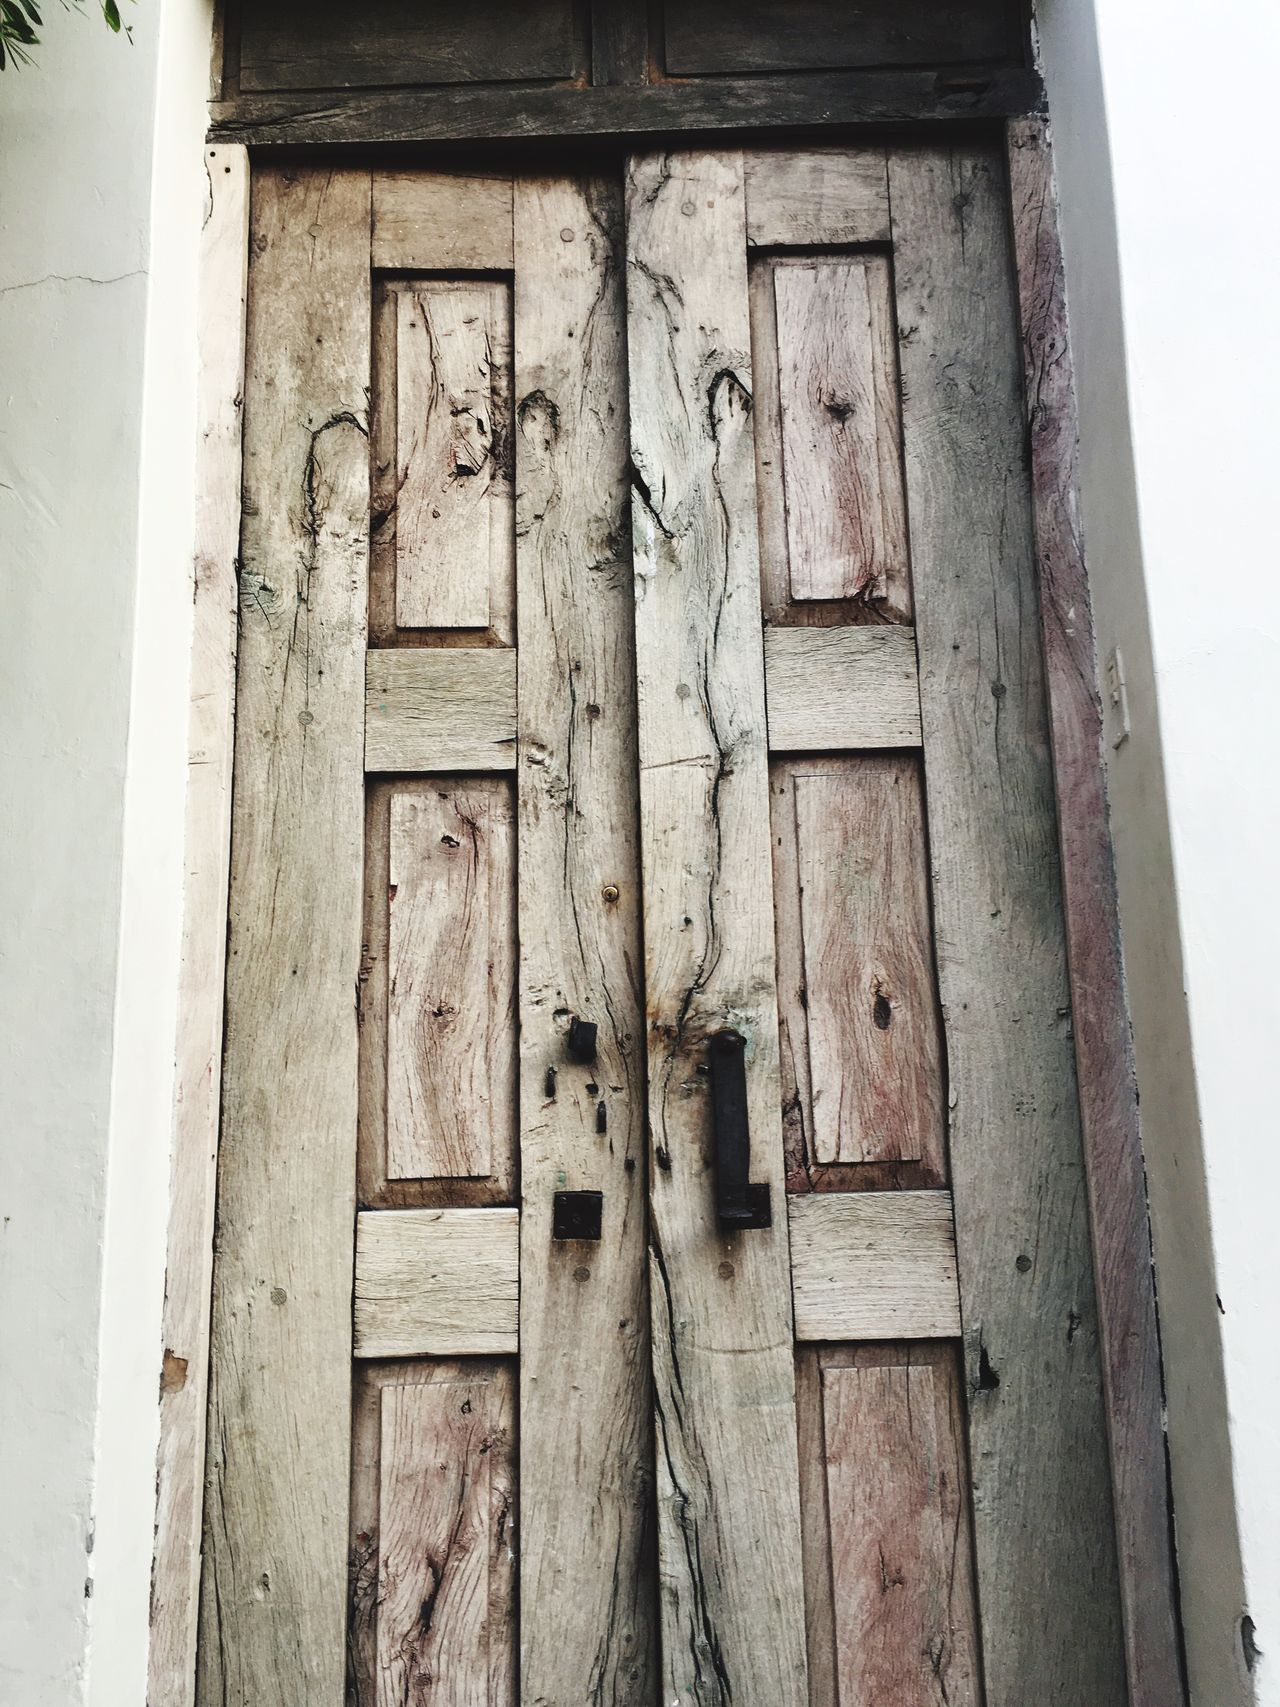 Door Wood - Material No People Day Outdoors Built Structure Architecture Close-up Building Exterior Disfrutando De La Vida Tranquility IPhone